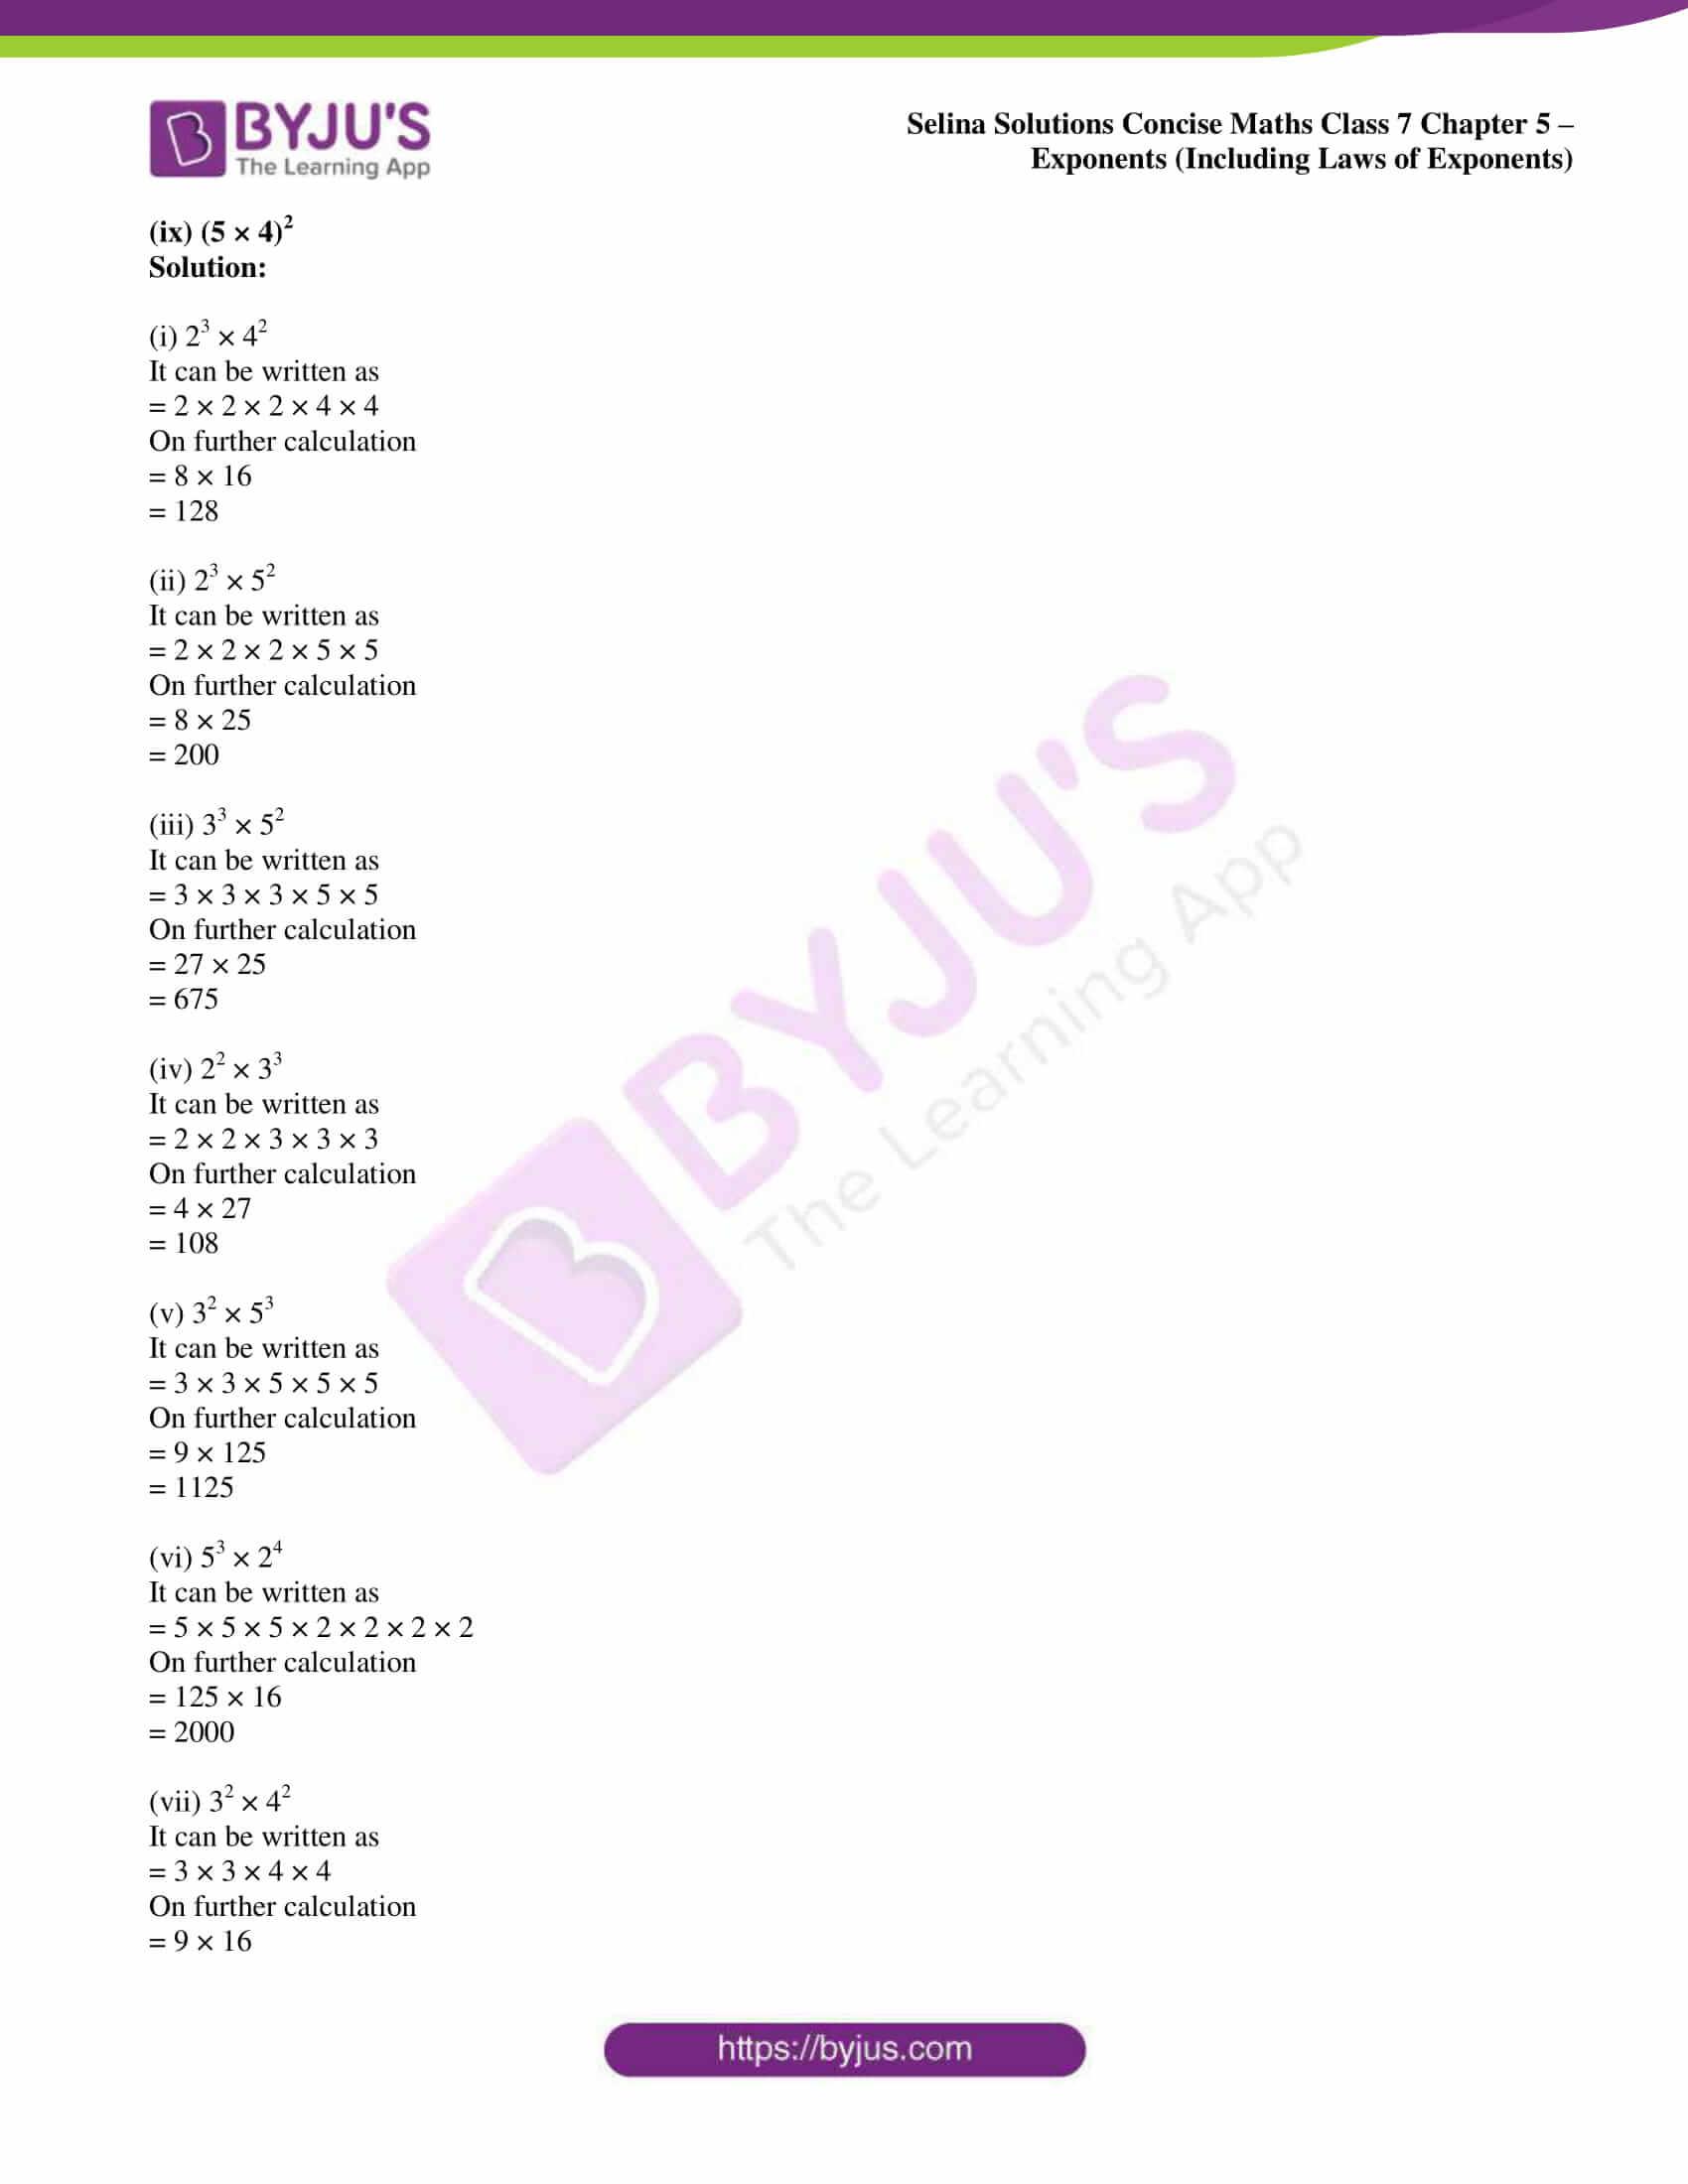 selina sol concise maths class 7 ch5 ex 5a 02